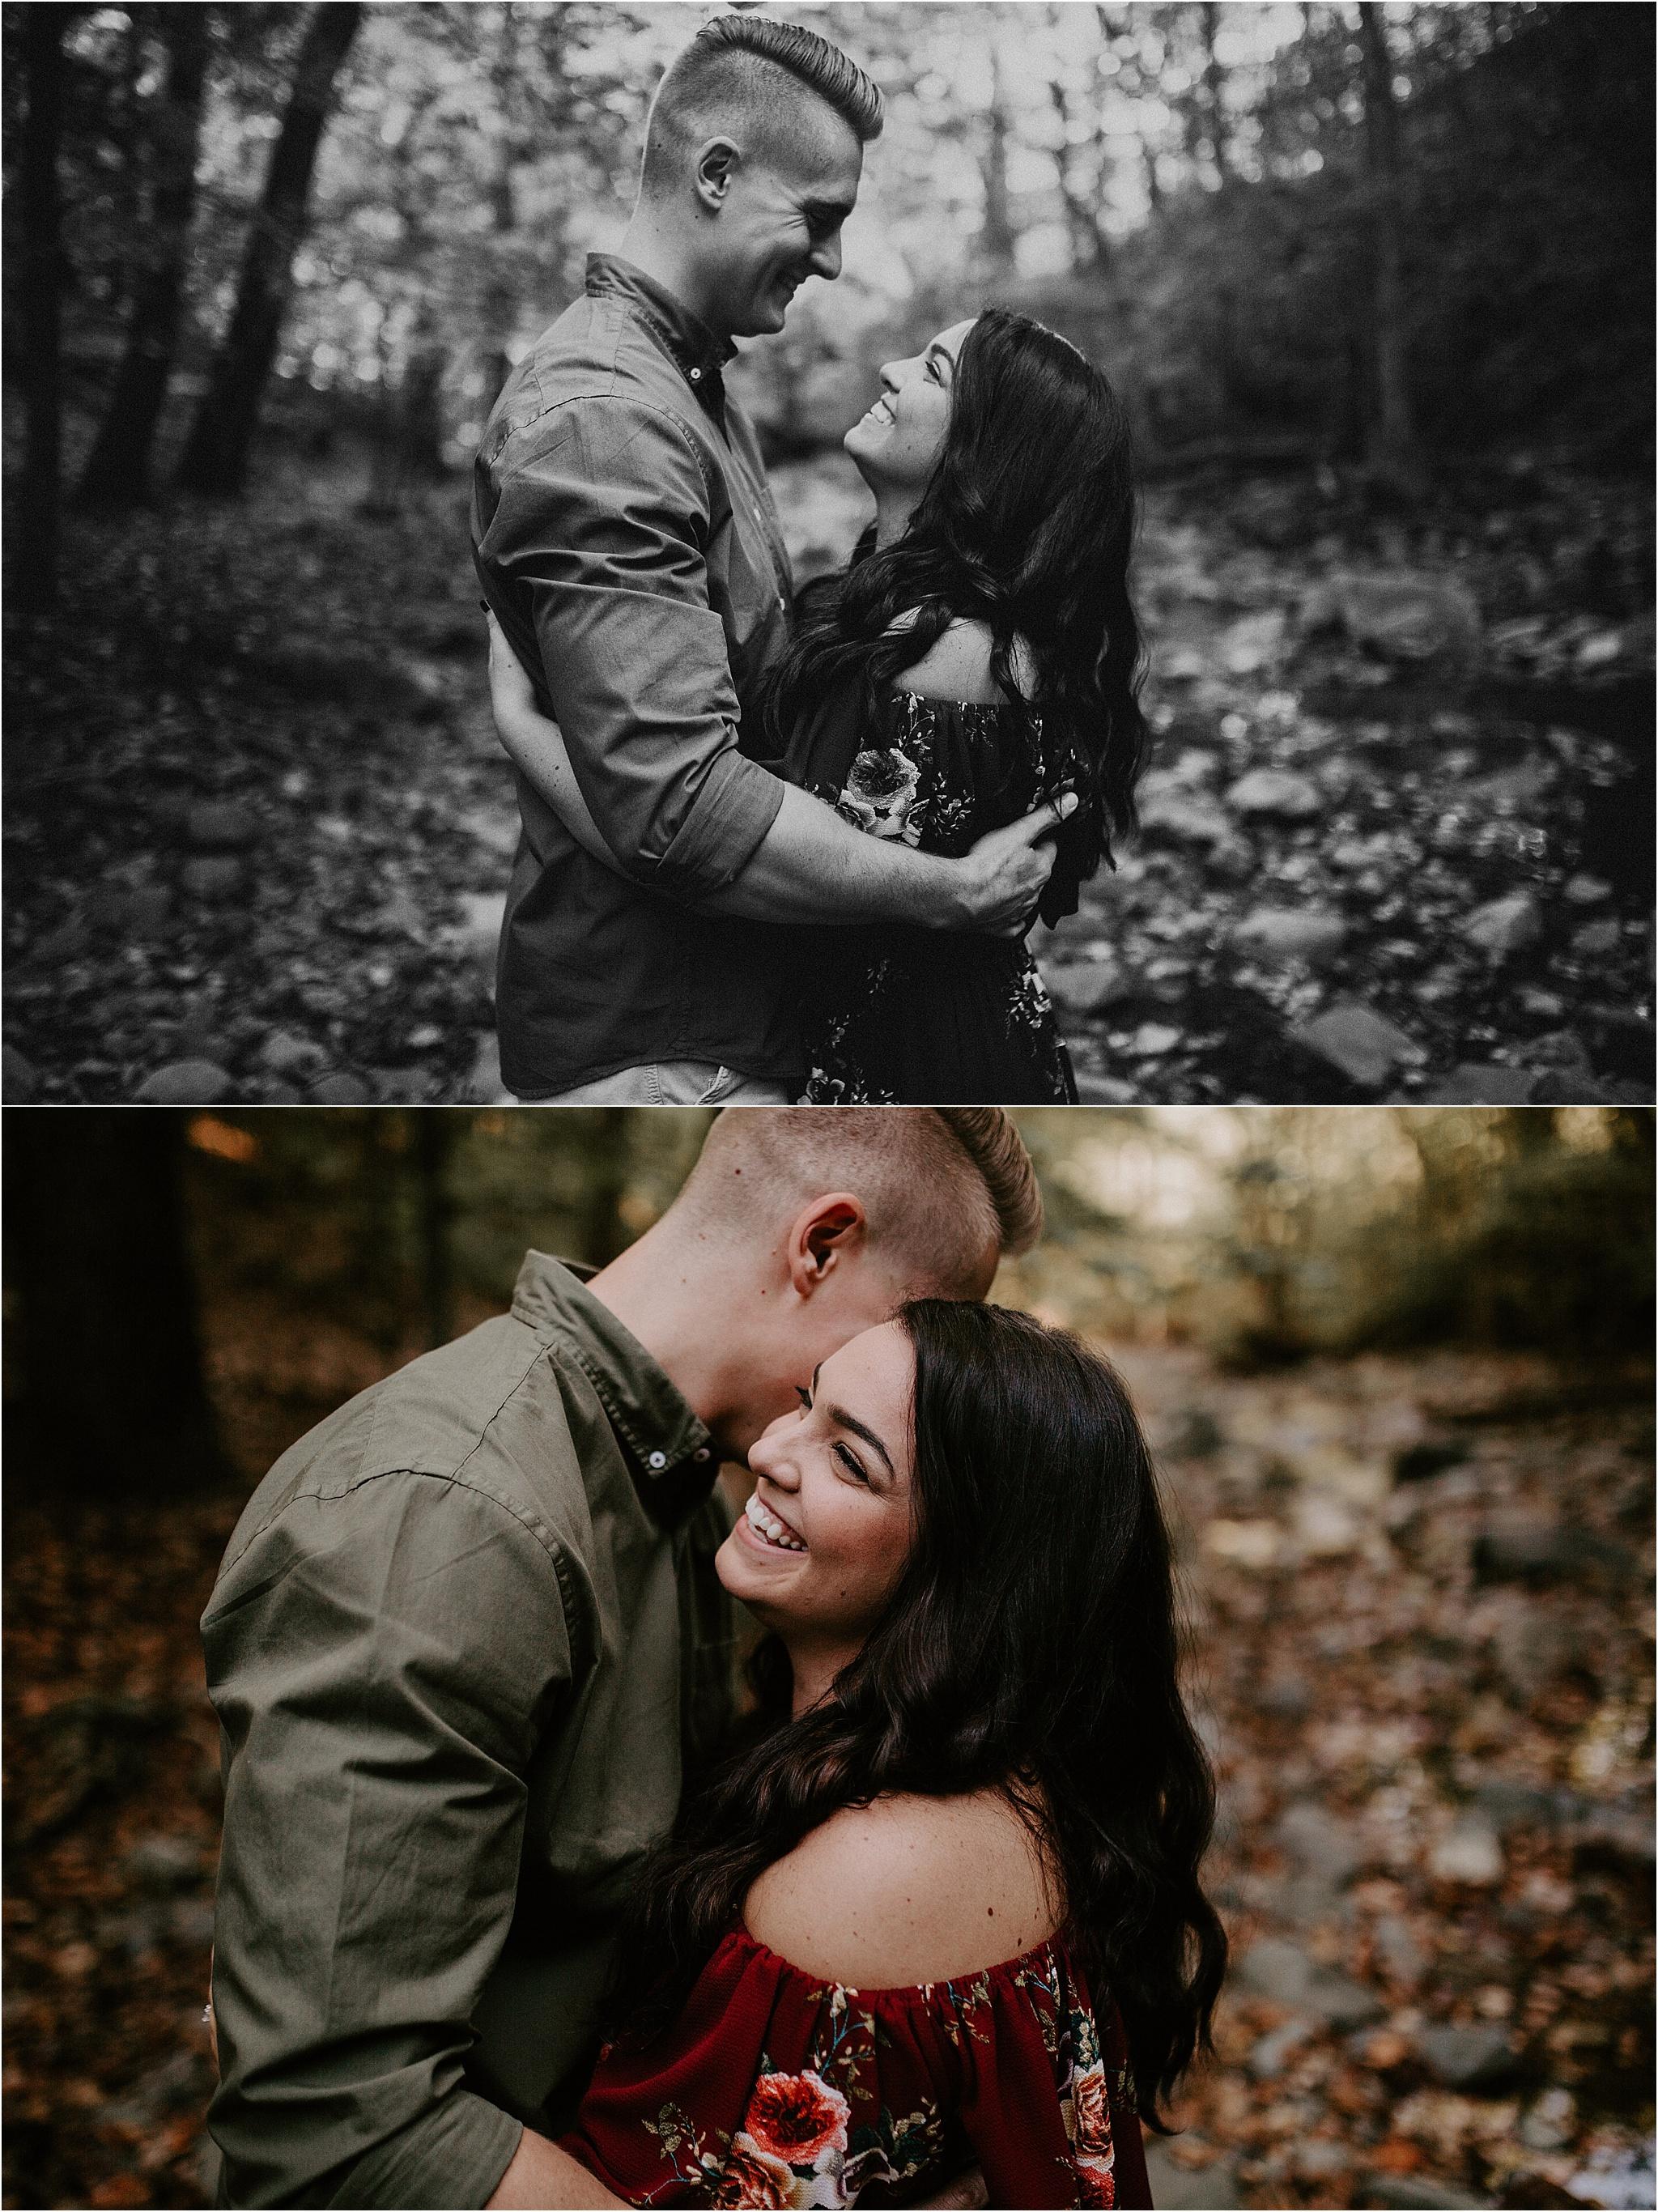 Sarah_Brookhart_Baltimore_Philly_Wedding_Photographer_0003-1.jpg